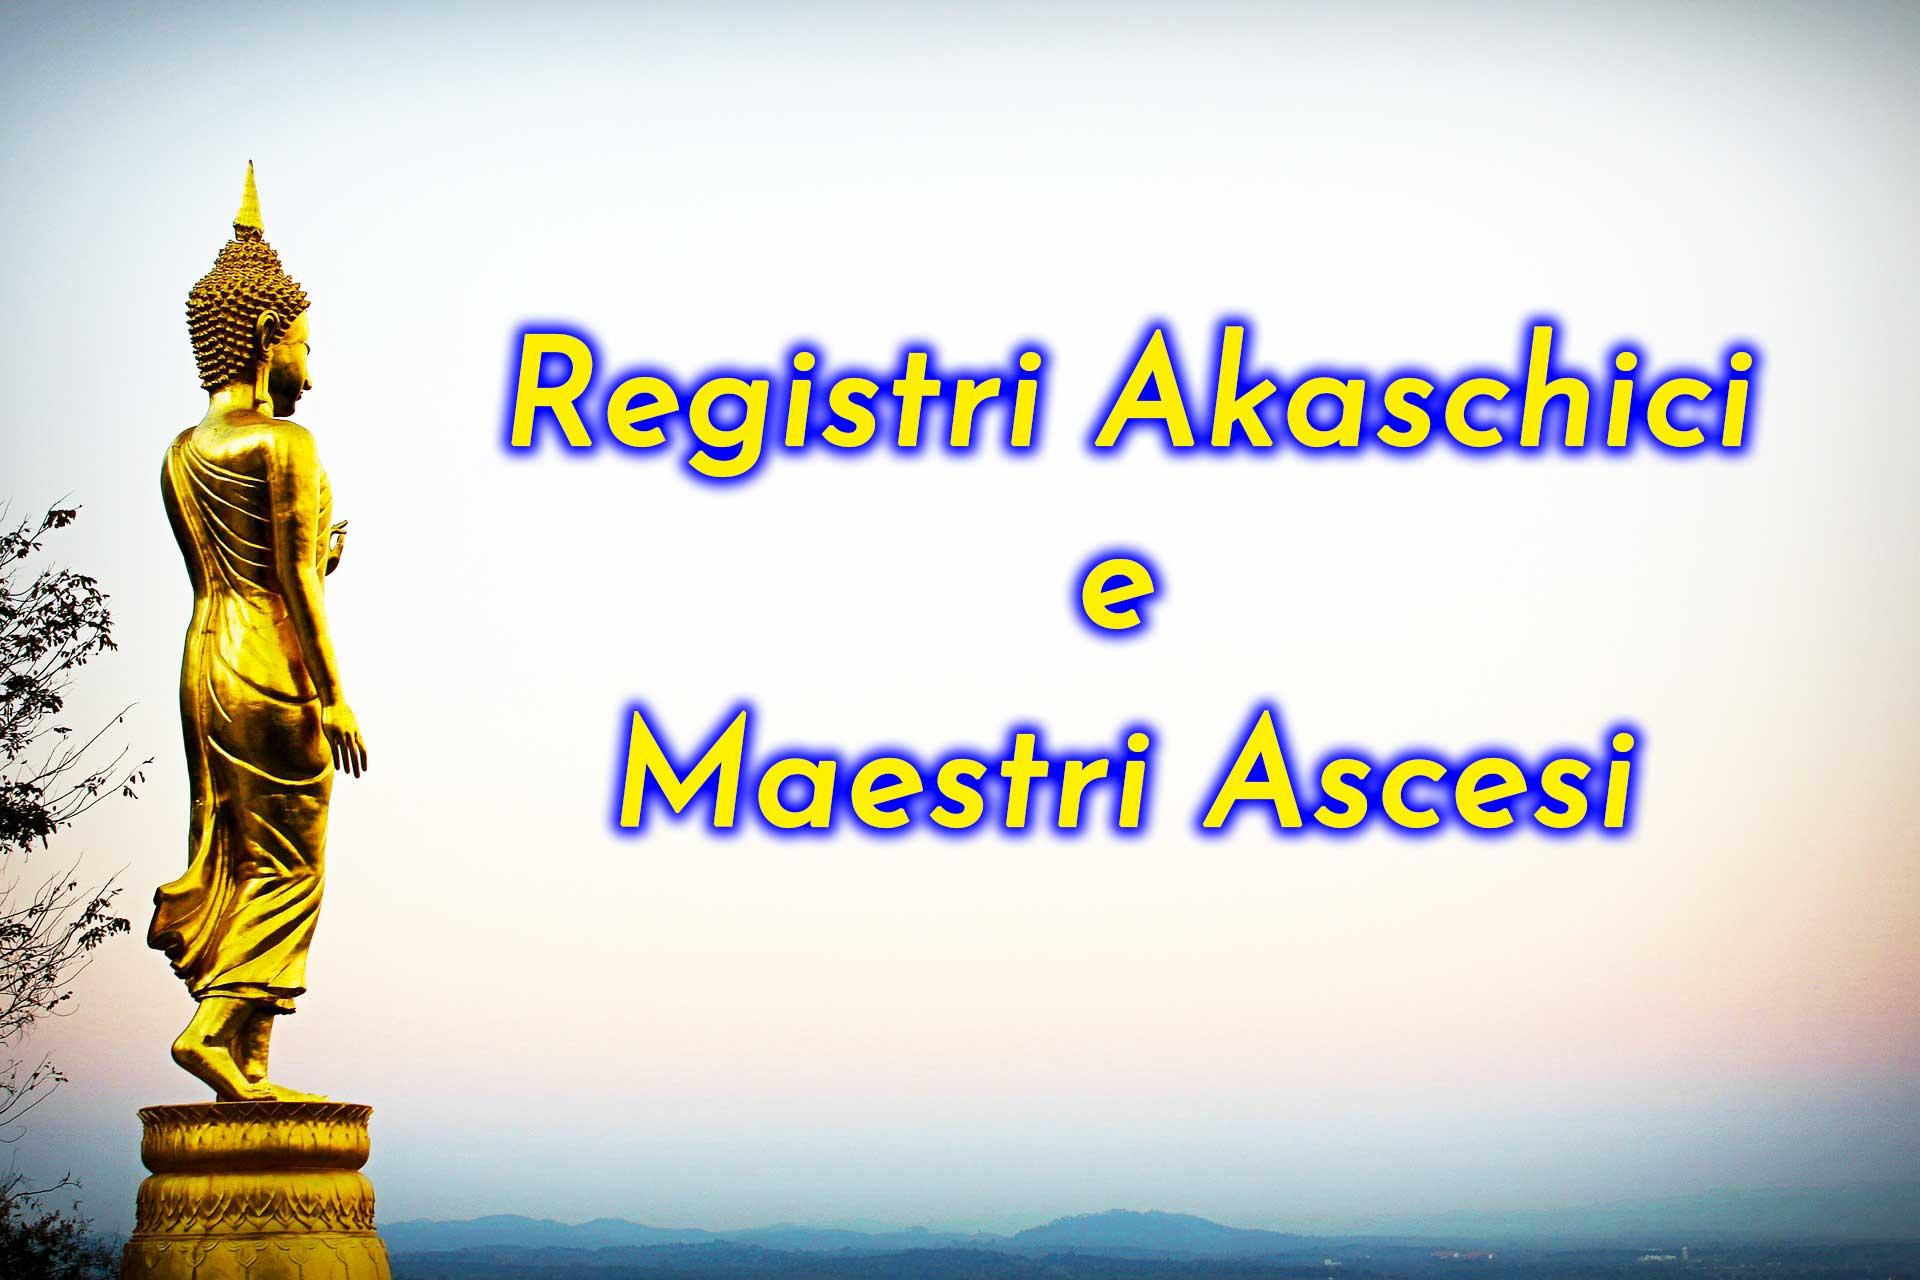 Registri Akashici e Maestri Ascesi